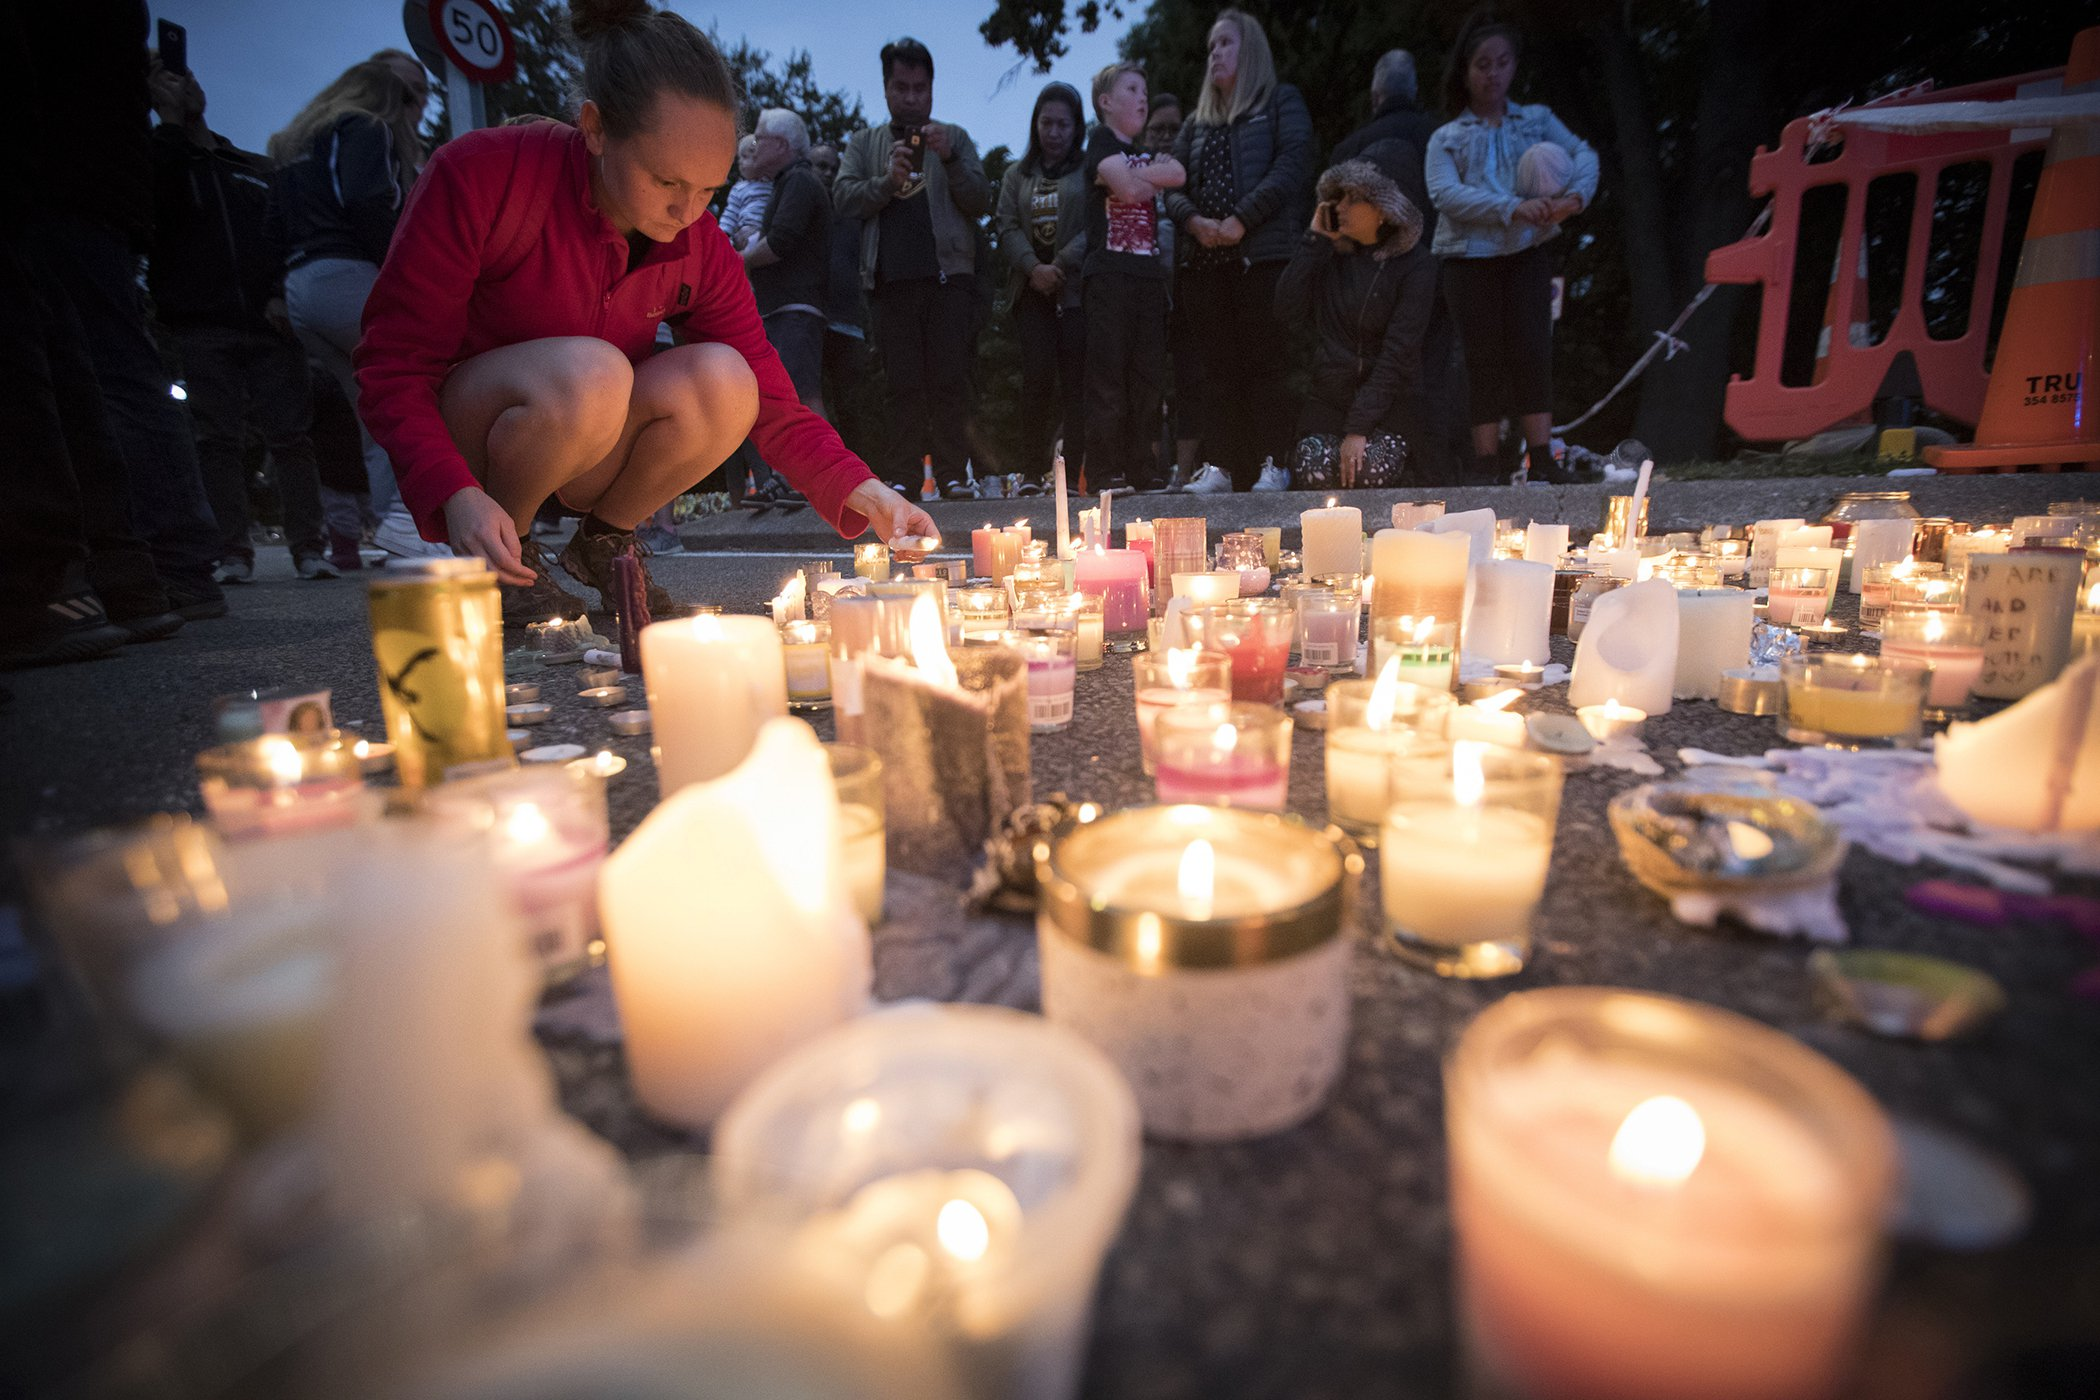 New-Zealand-Aftermath-Shooting-Vigil.jpg